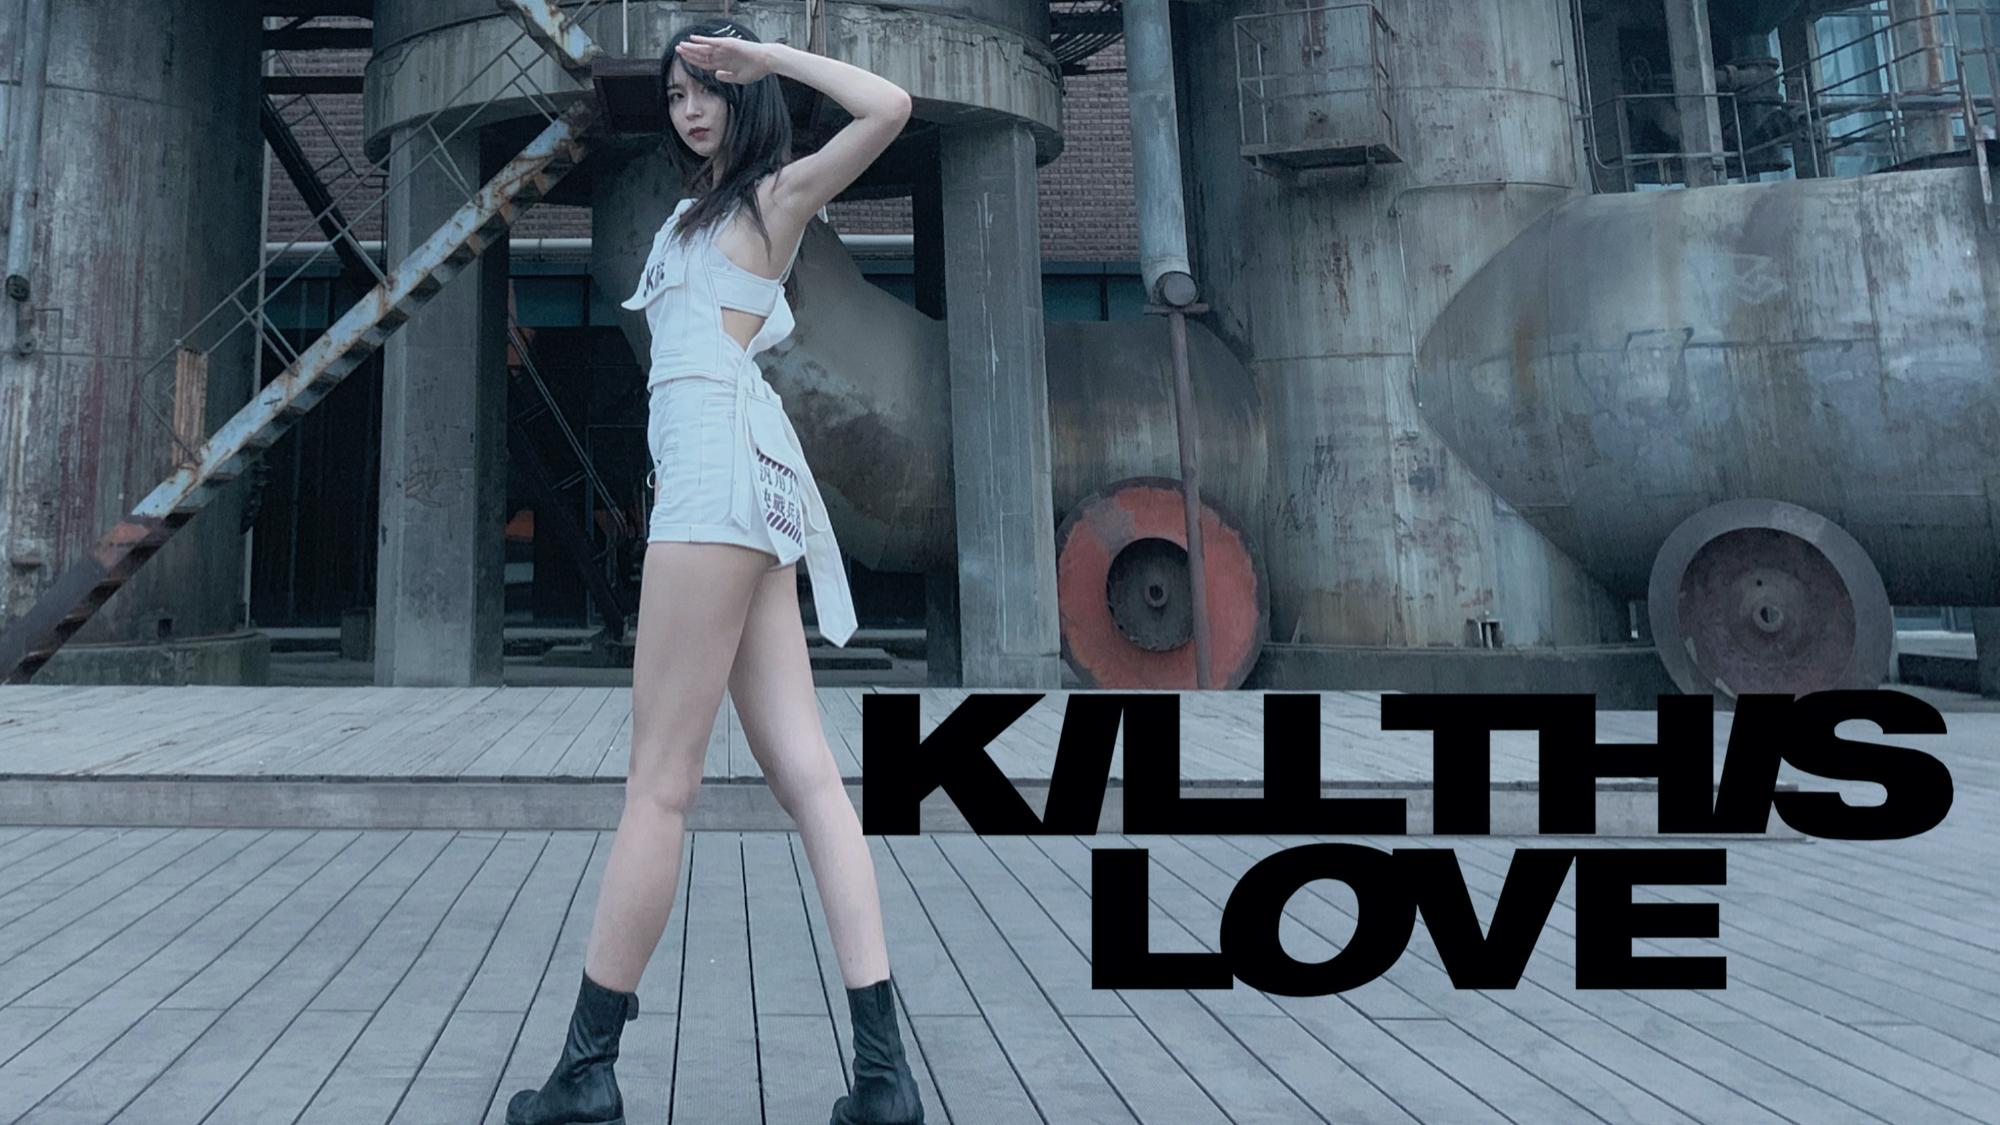 【JacQwist】Kill This Love 击穿你的心